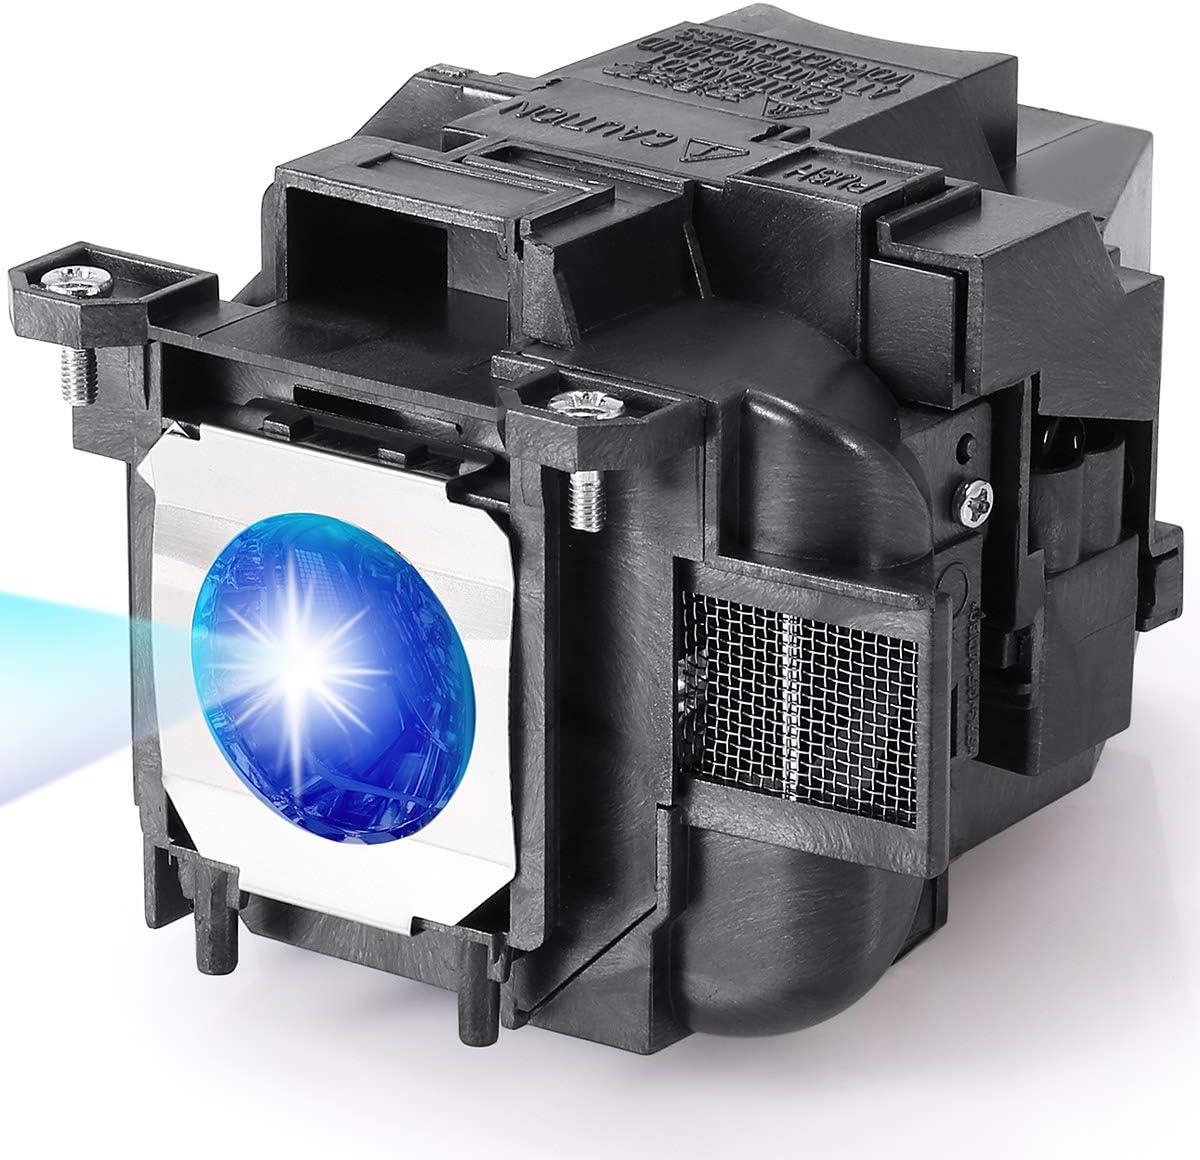 RICH LIGHTING ELP78 Projector Lamp Bulb for Epson ELPLP78 PowerLite Home Cinema 2045 2030 2000 730HD 725HD 600 VS230 VS330 VS335w EX7220 EX3220 EX5220 EX6220 EX7230 EX7235 V13h010l78 Replacement Bulb